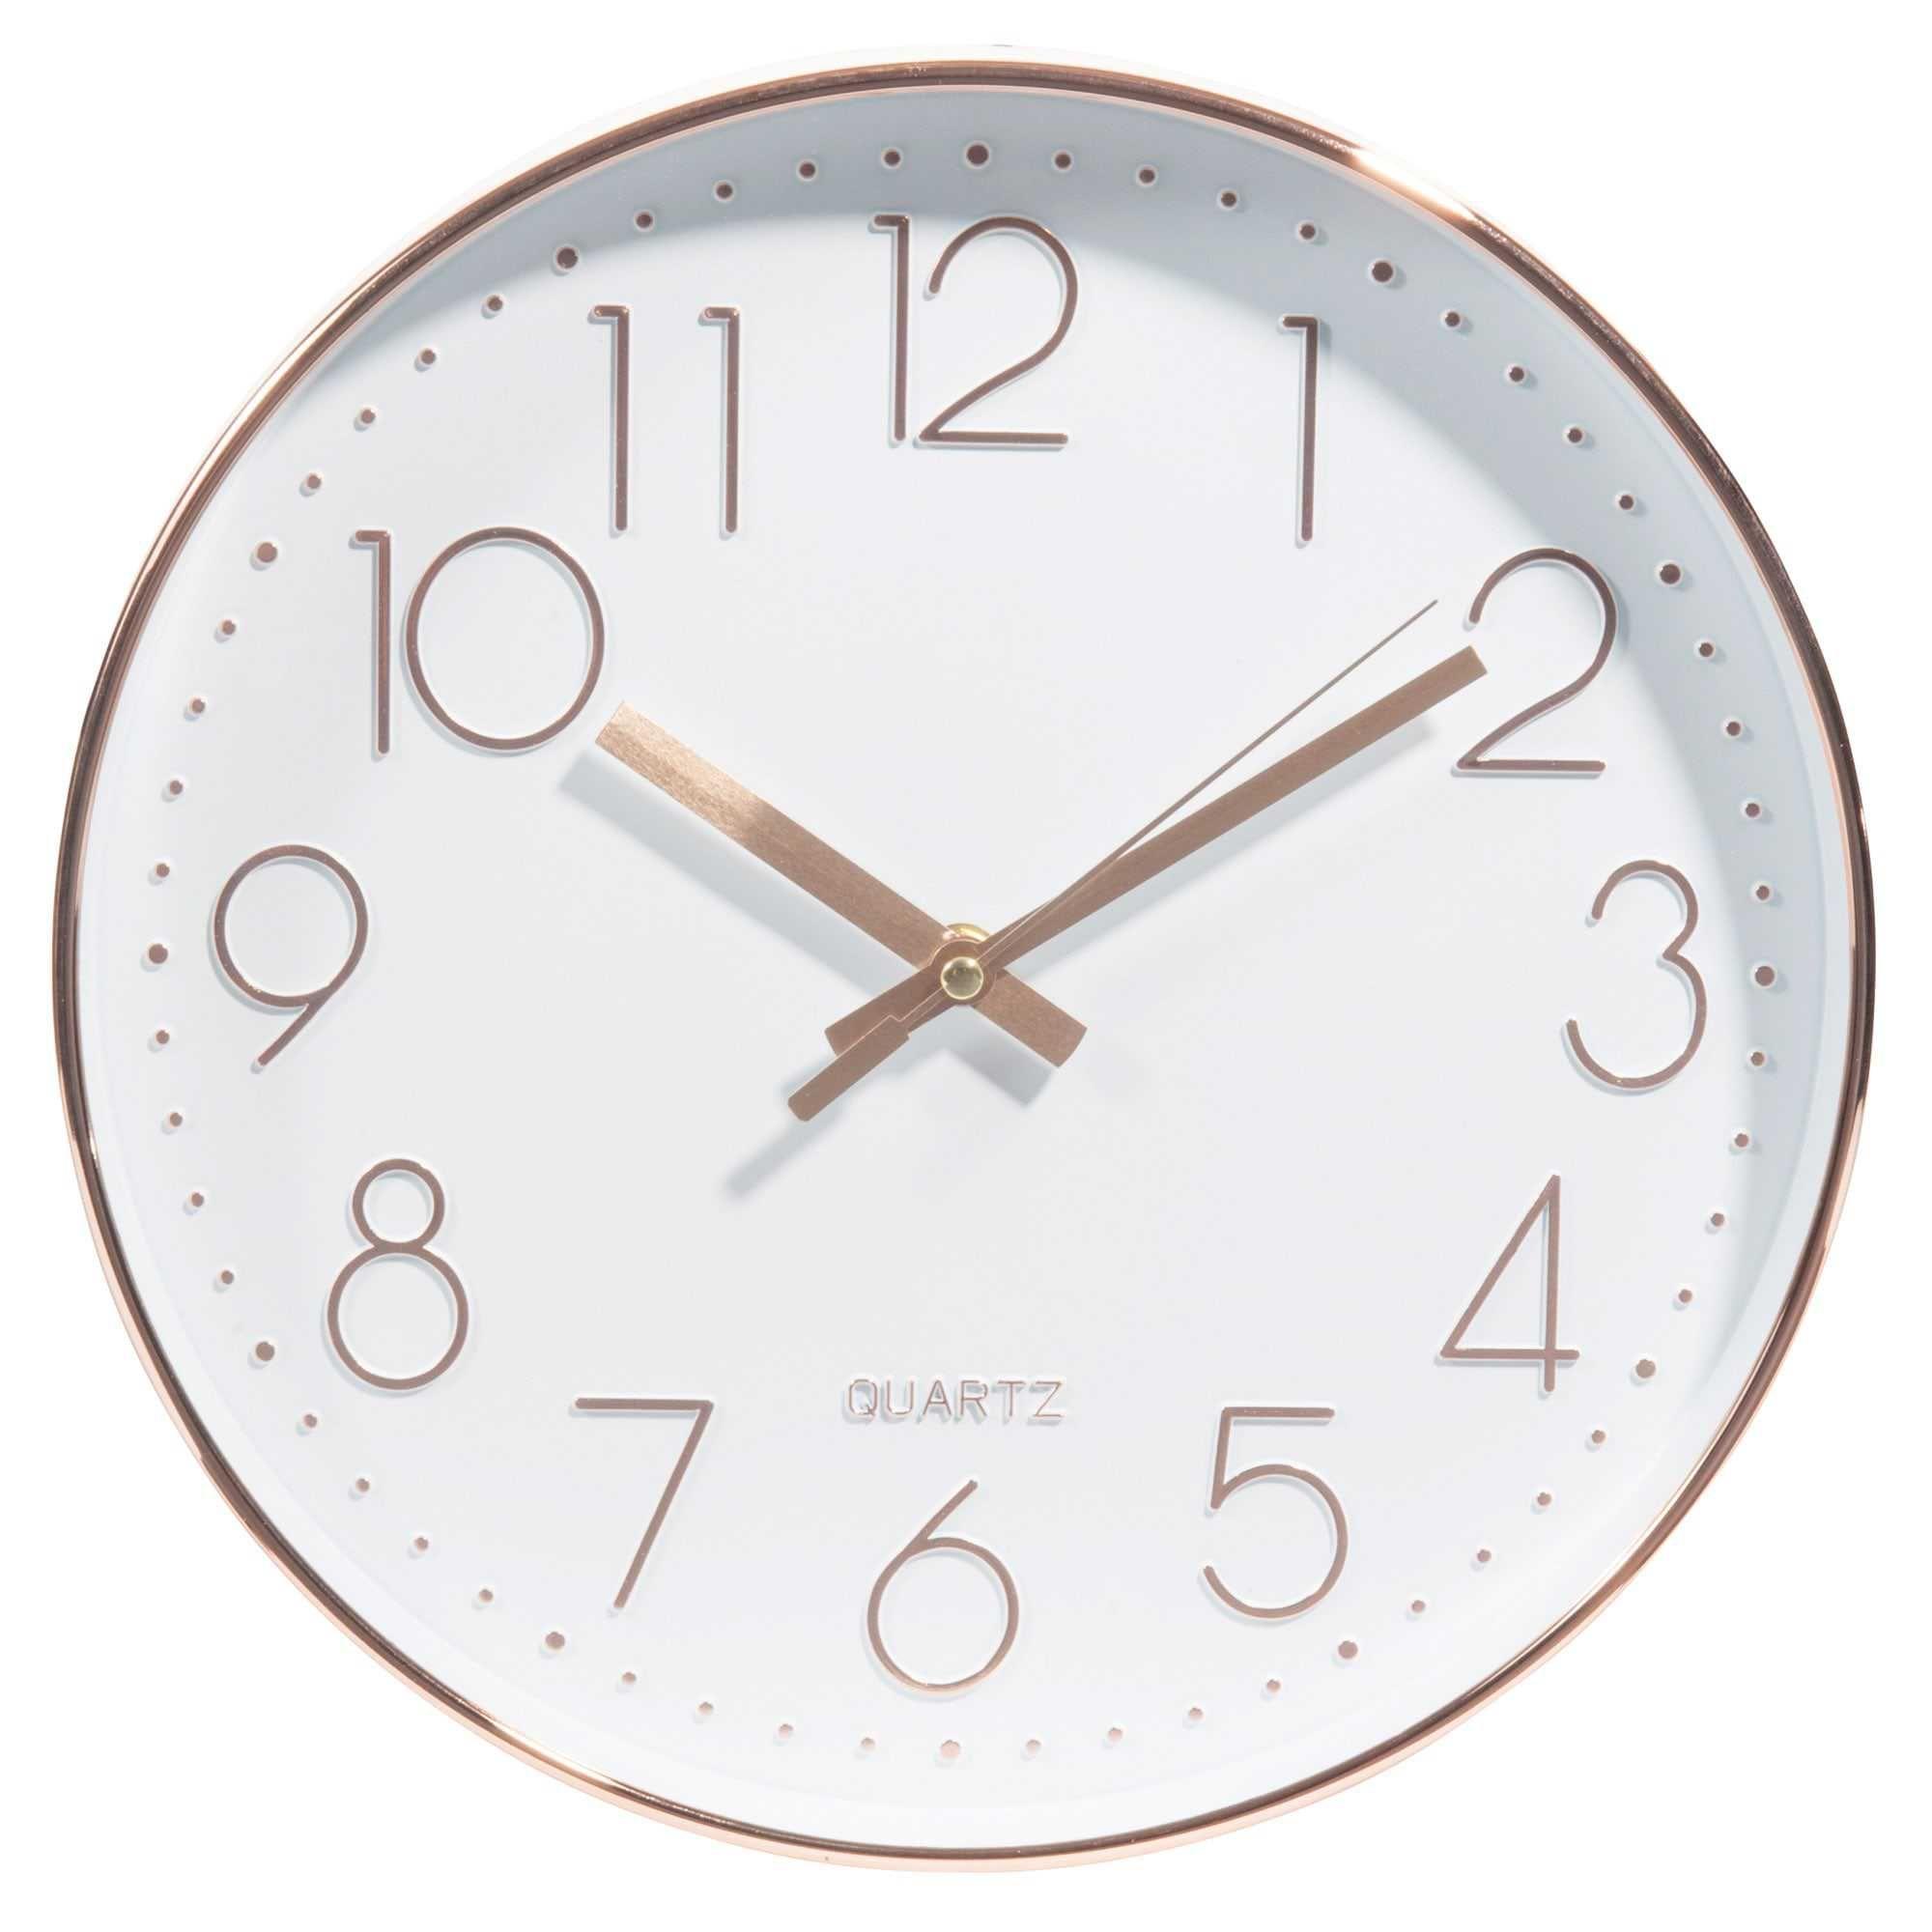 Wanduhr D 31 Cm Swaggy Copper Jetzt Bestellen Unter Https Moebel Ladendirekt De Dekoration Uhren Wanduhren Uid D44a0bb8 1ce0 526 Wanduhr Uhrideen Wanduhren